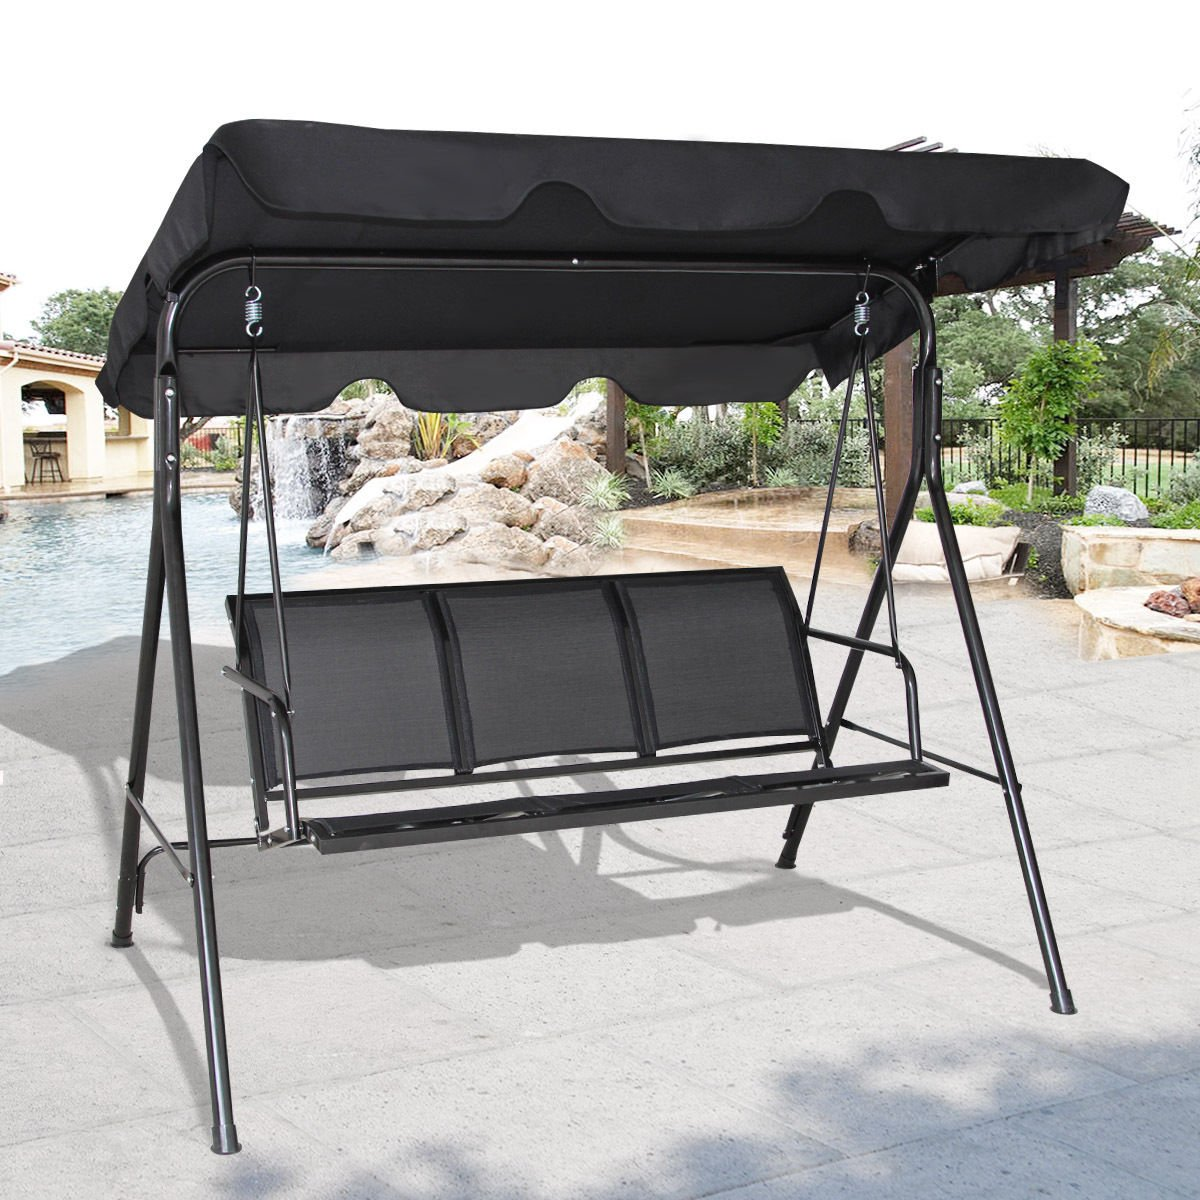 TANGKULA 3 Person Patio Swing Glider Outdoor Swing Hammock Glider Chair (Black)